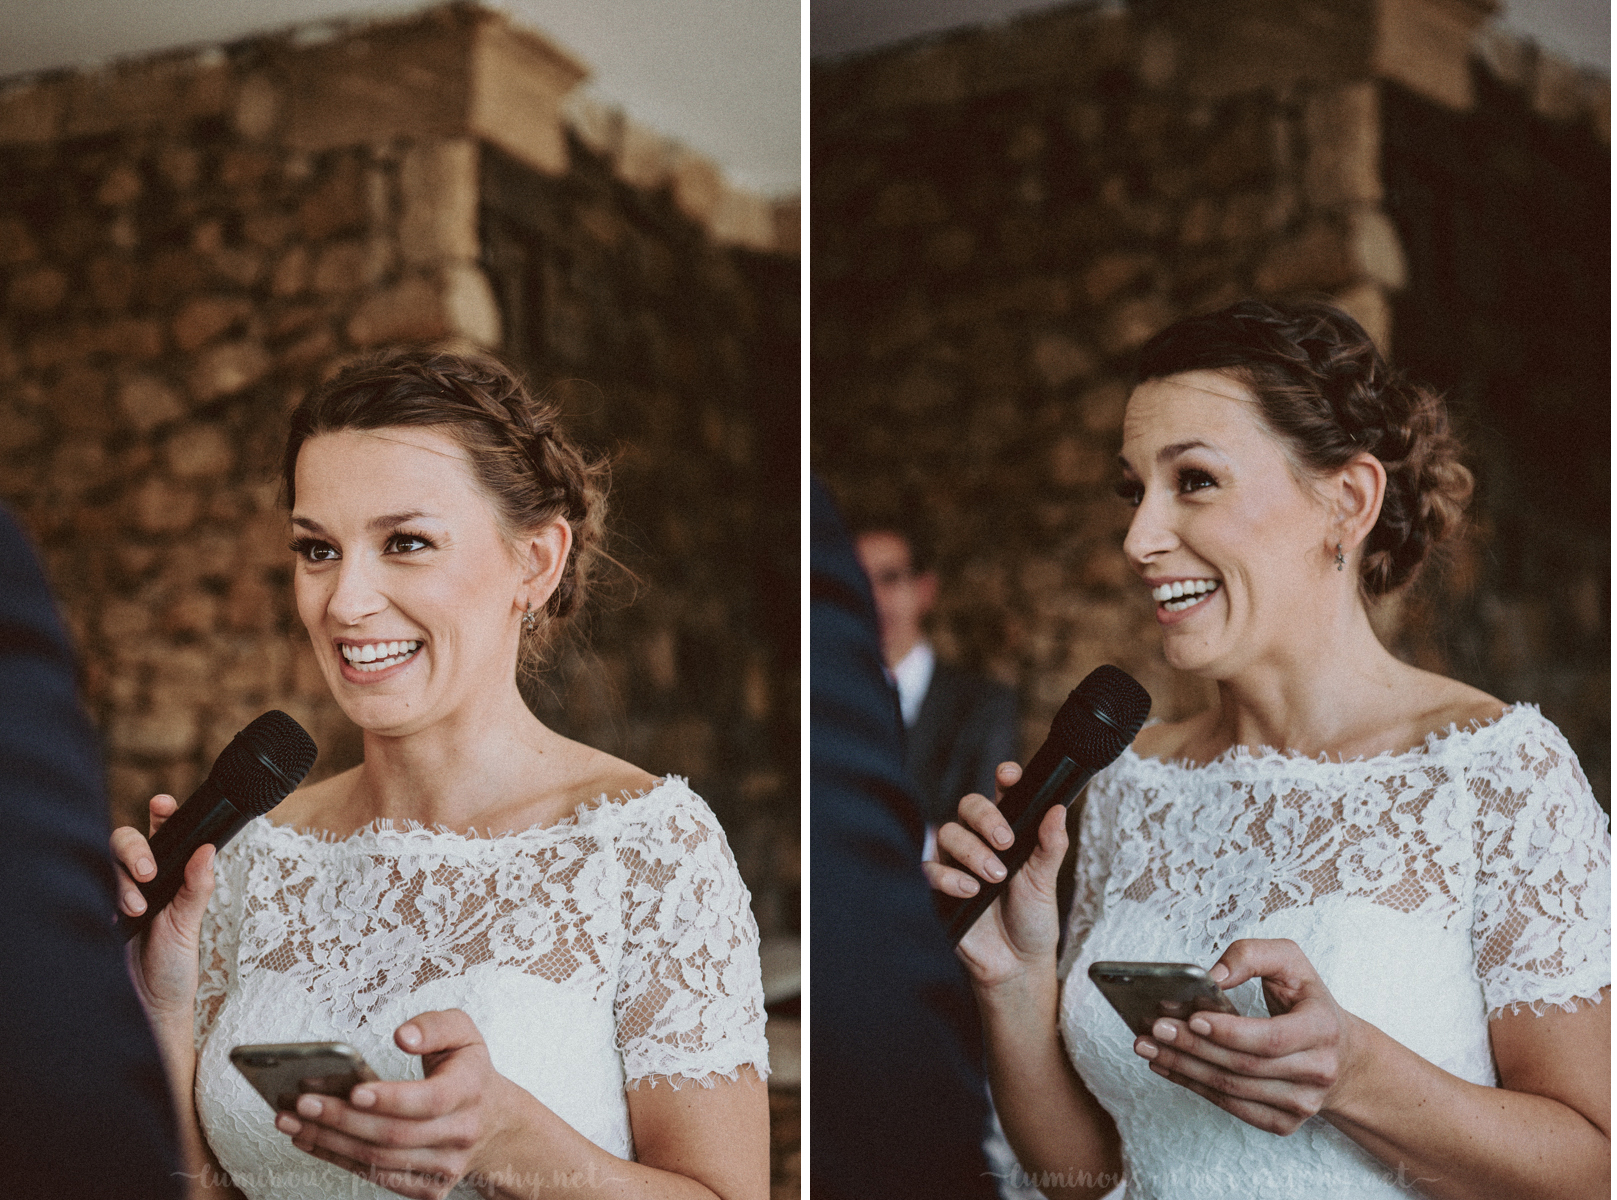 casamento-wedding-luminous-photography-porto-karolina-pedro-301.jpg